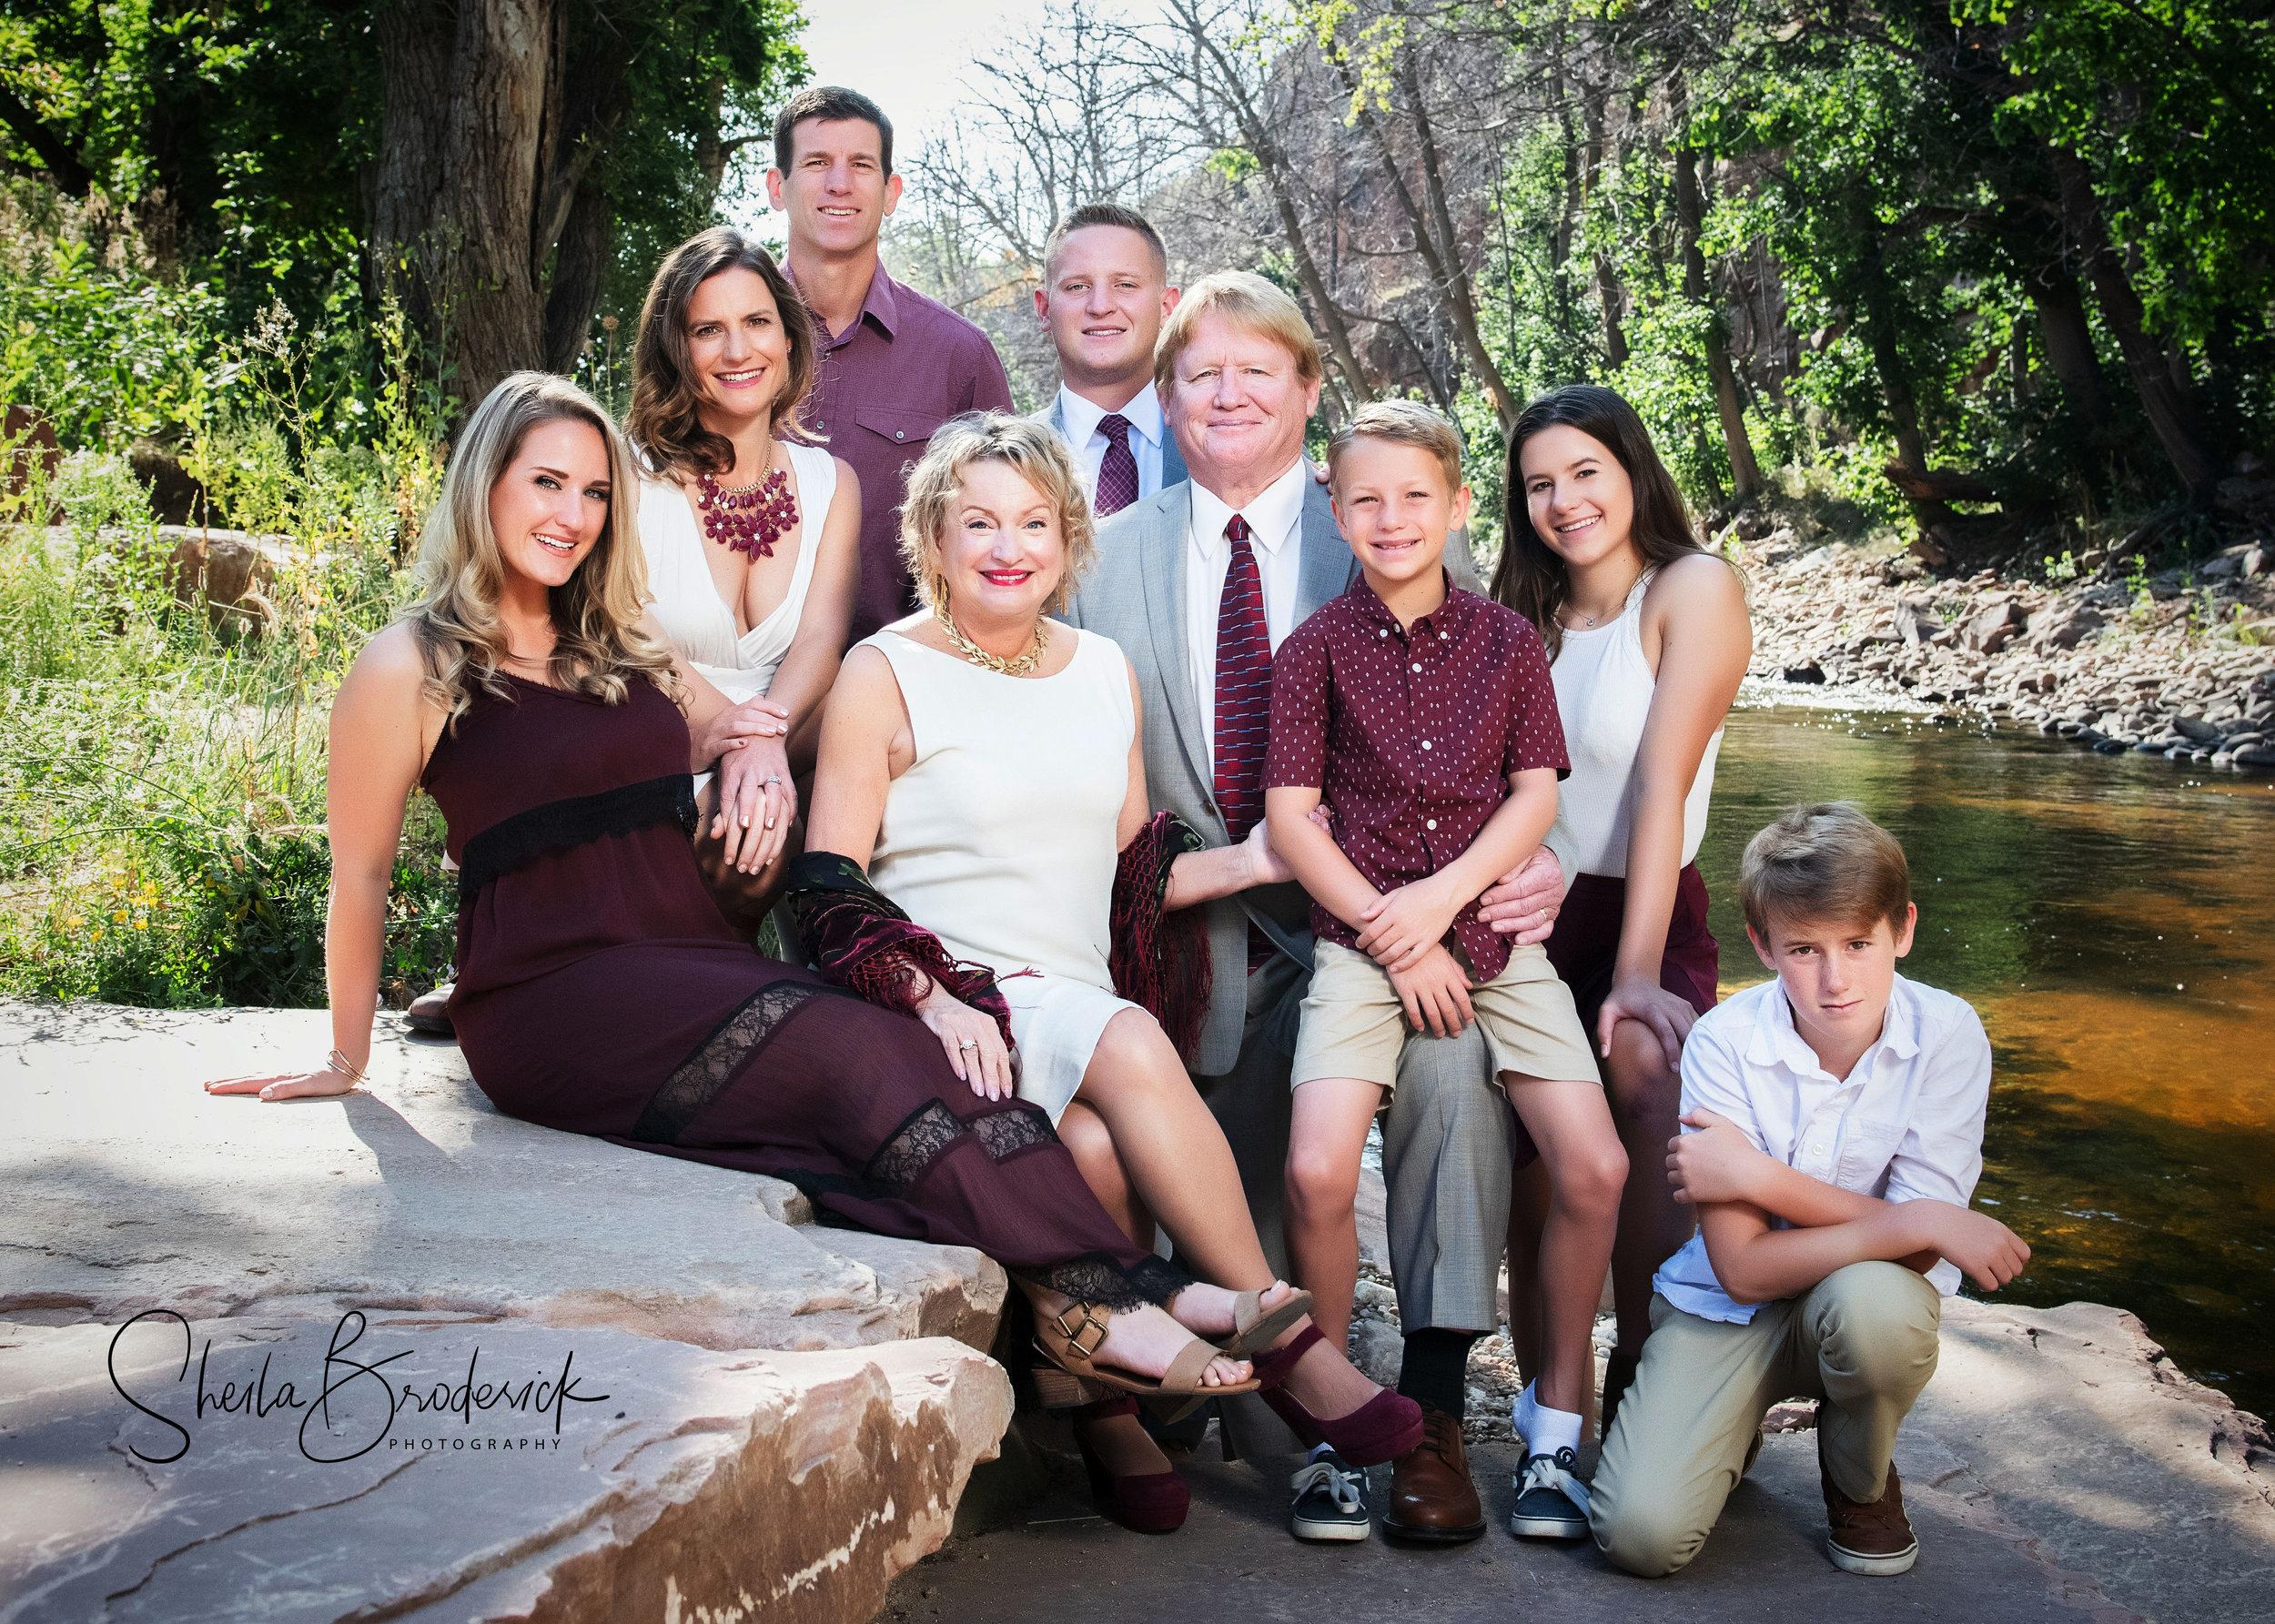 Family_Portraits_Sheila_Broderick_Photography_.jpg